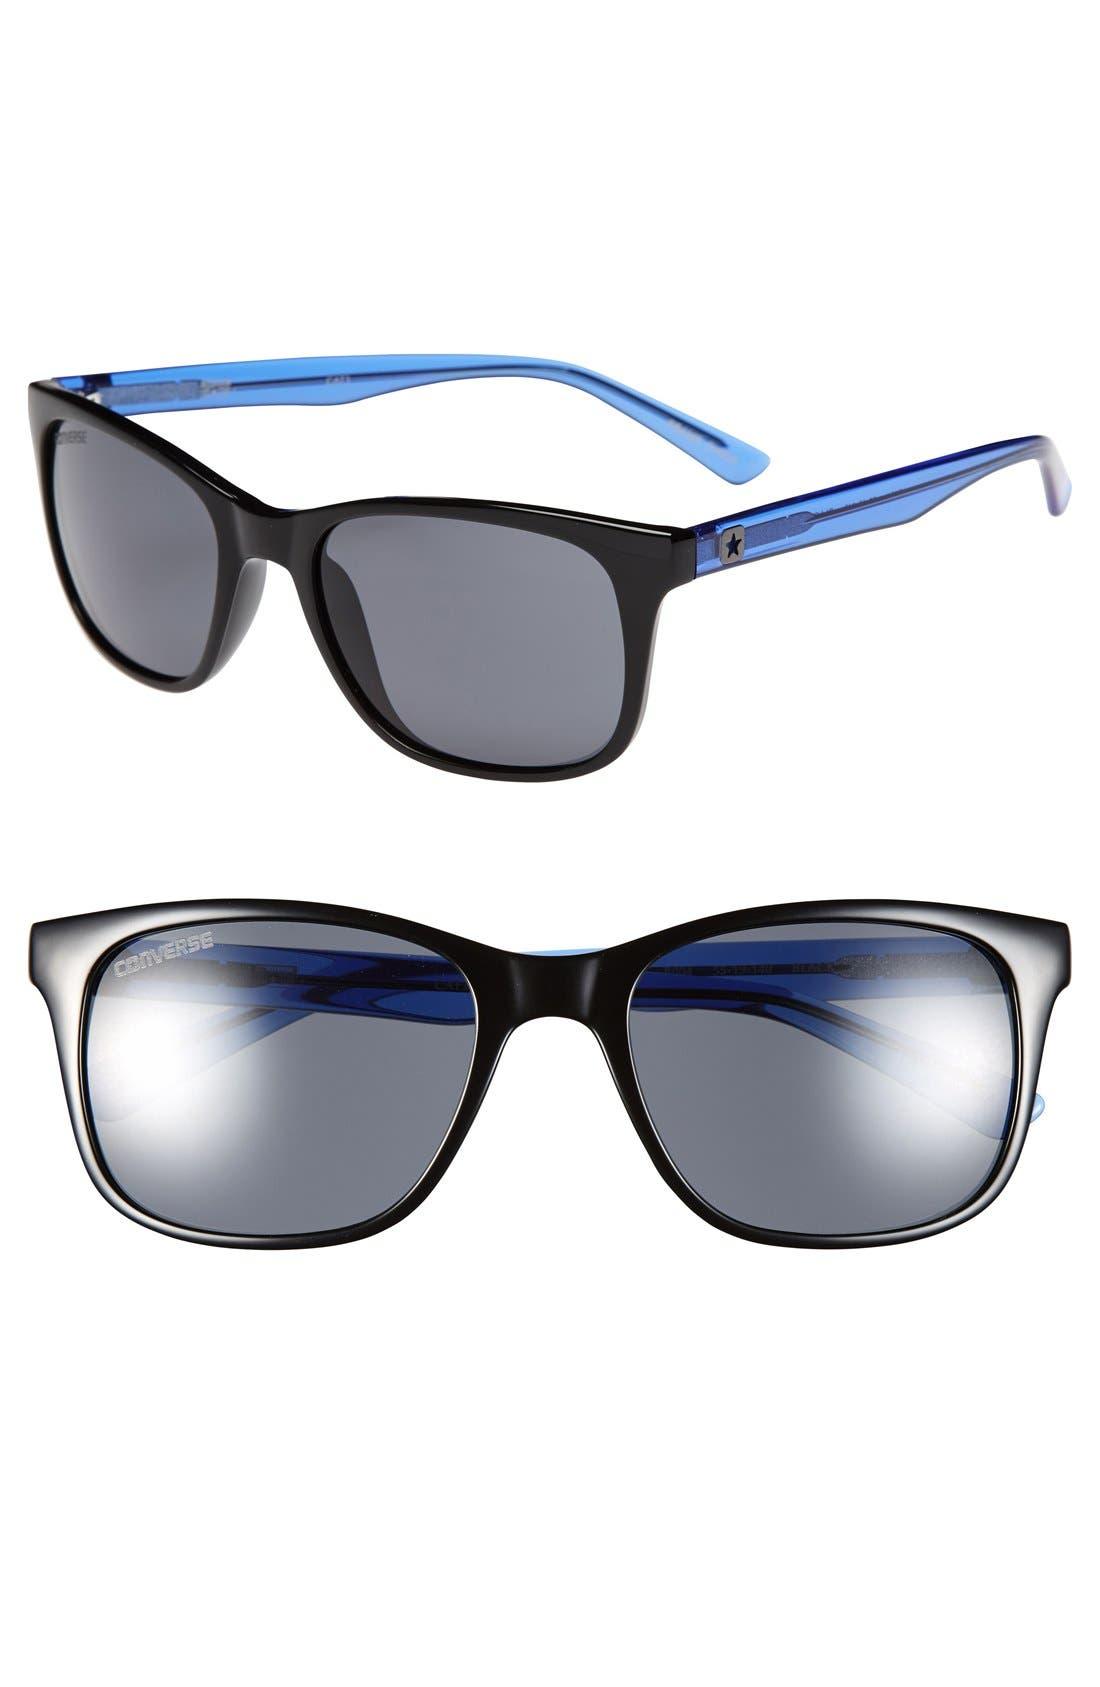 Main Image - Converse 55mm Retro Sunglasses